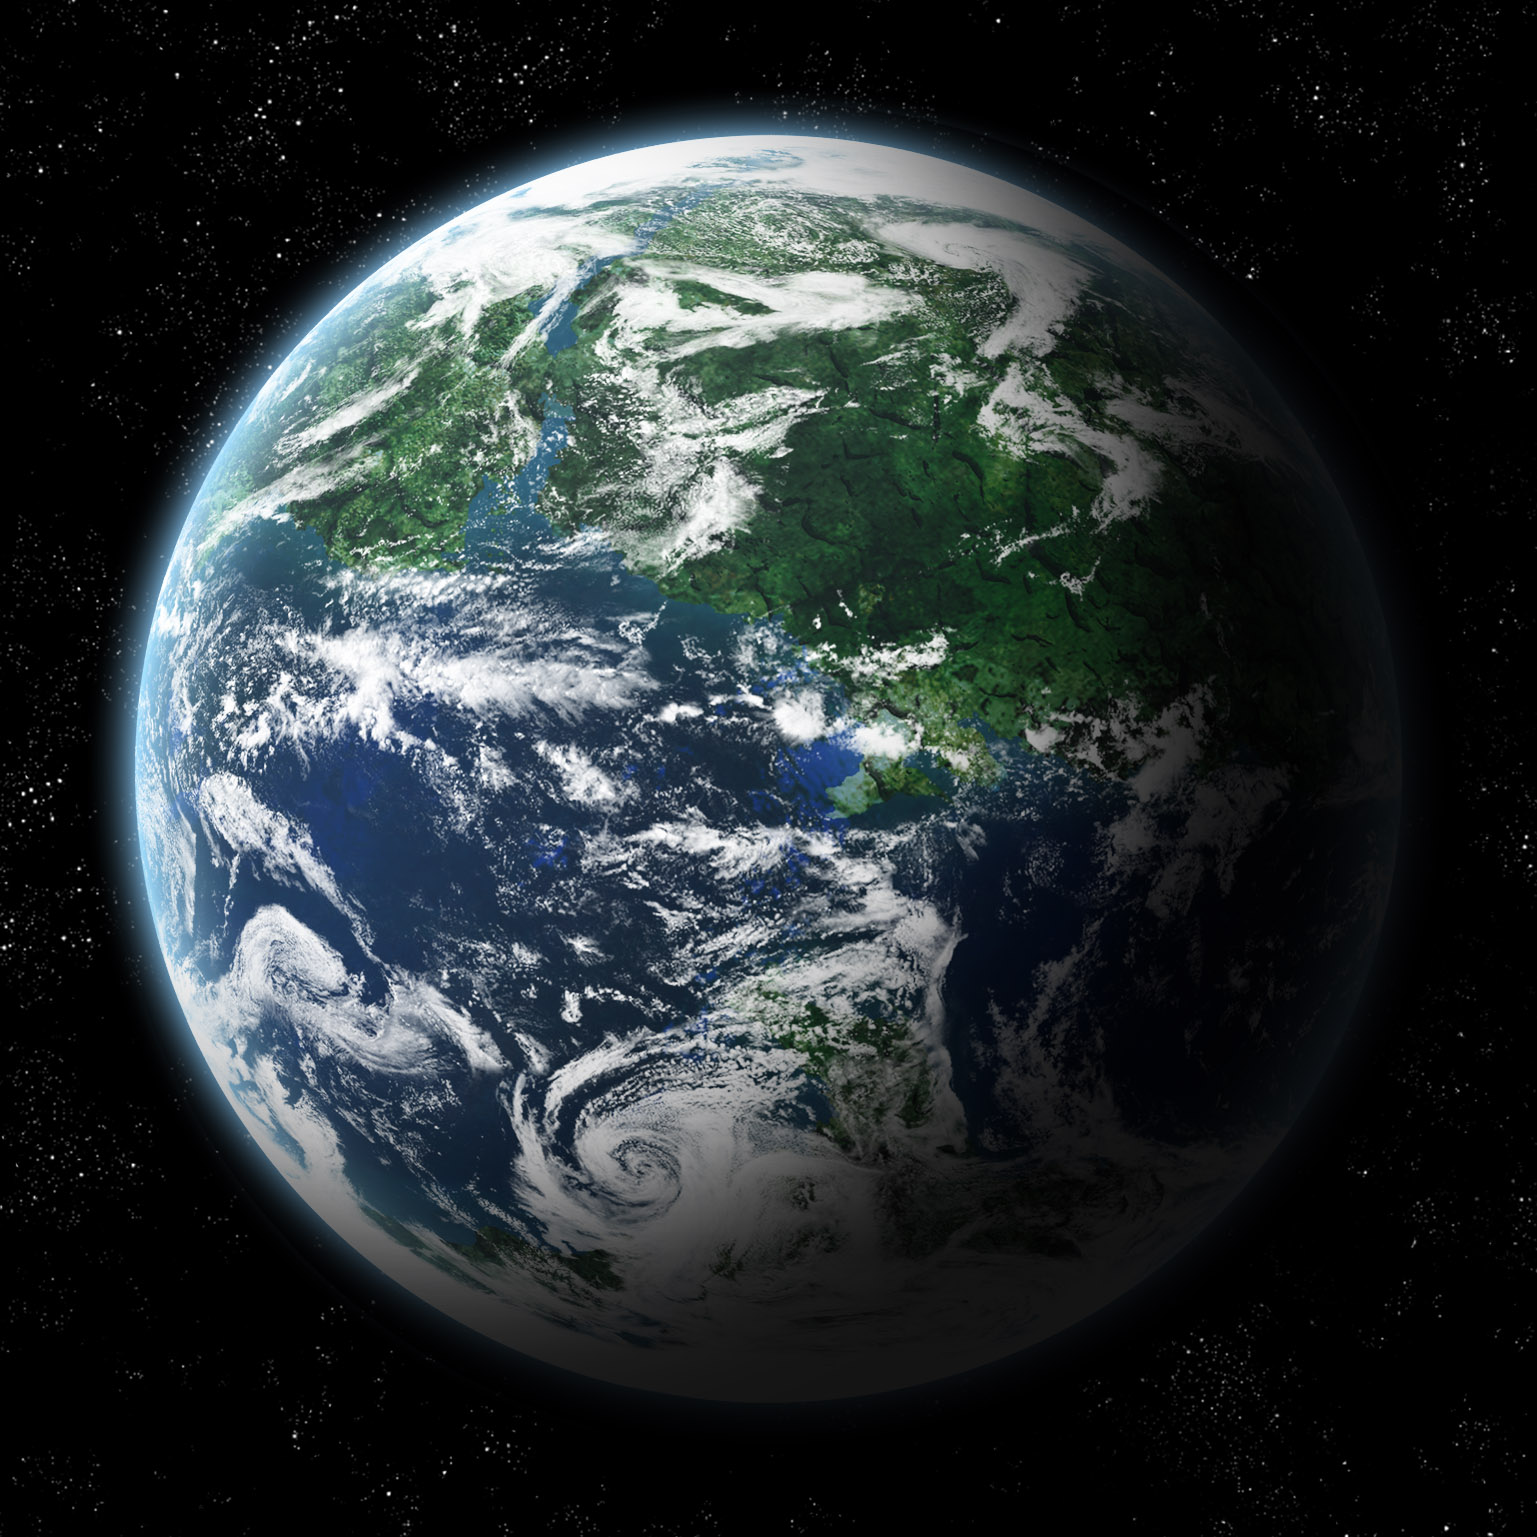 war planets moons - photo #28